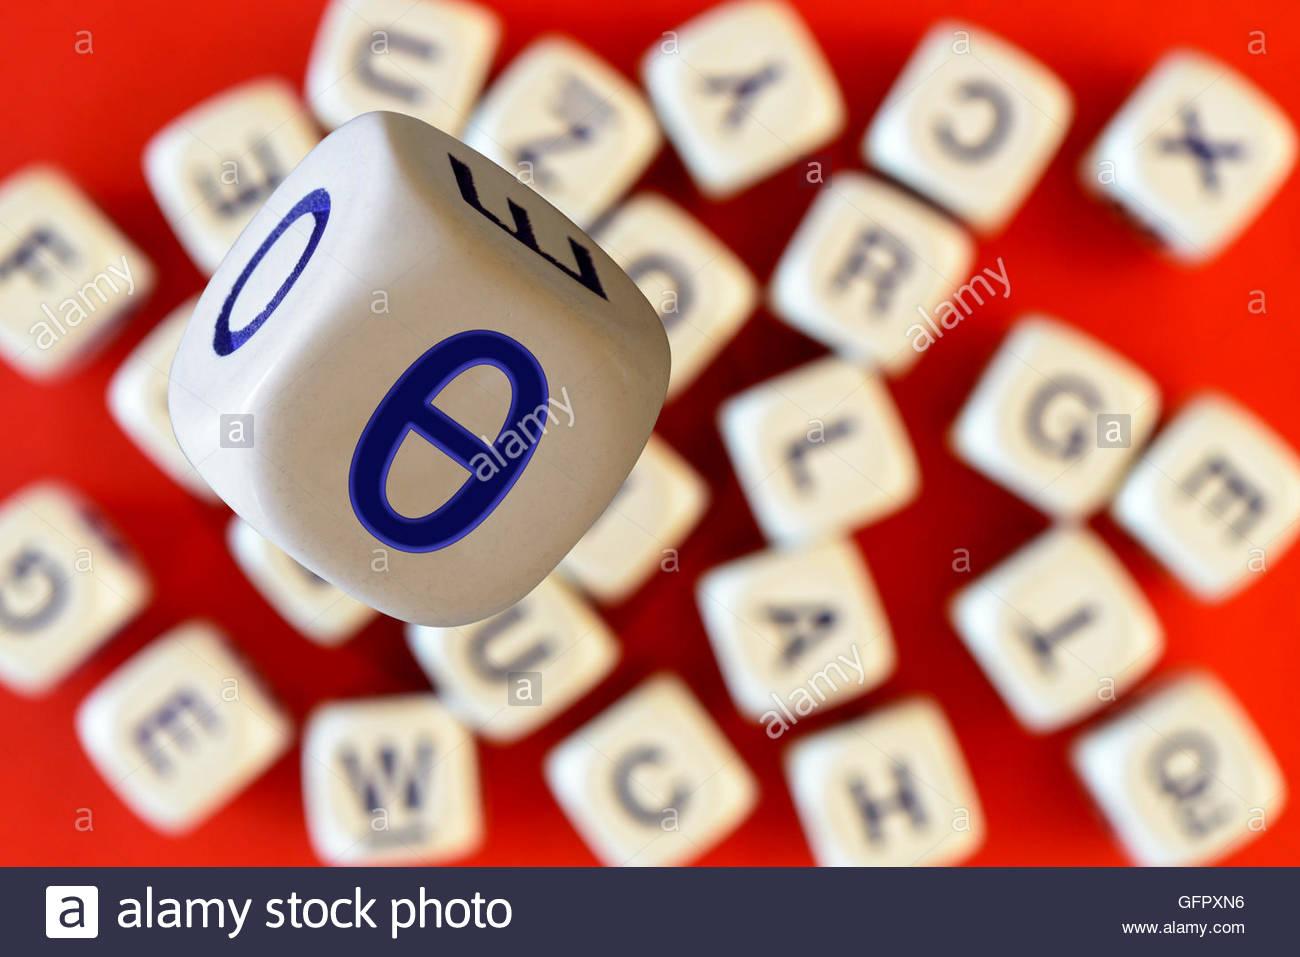 Theta On The Face Of Alphabet Dice Dorset England Britain Uk